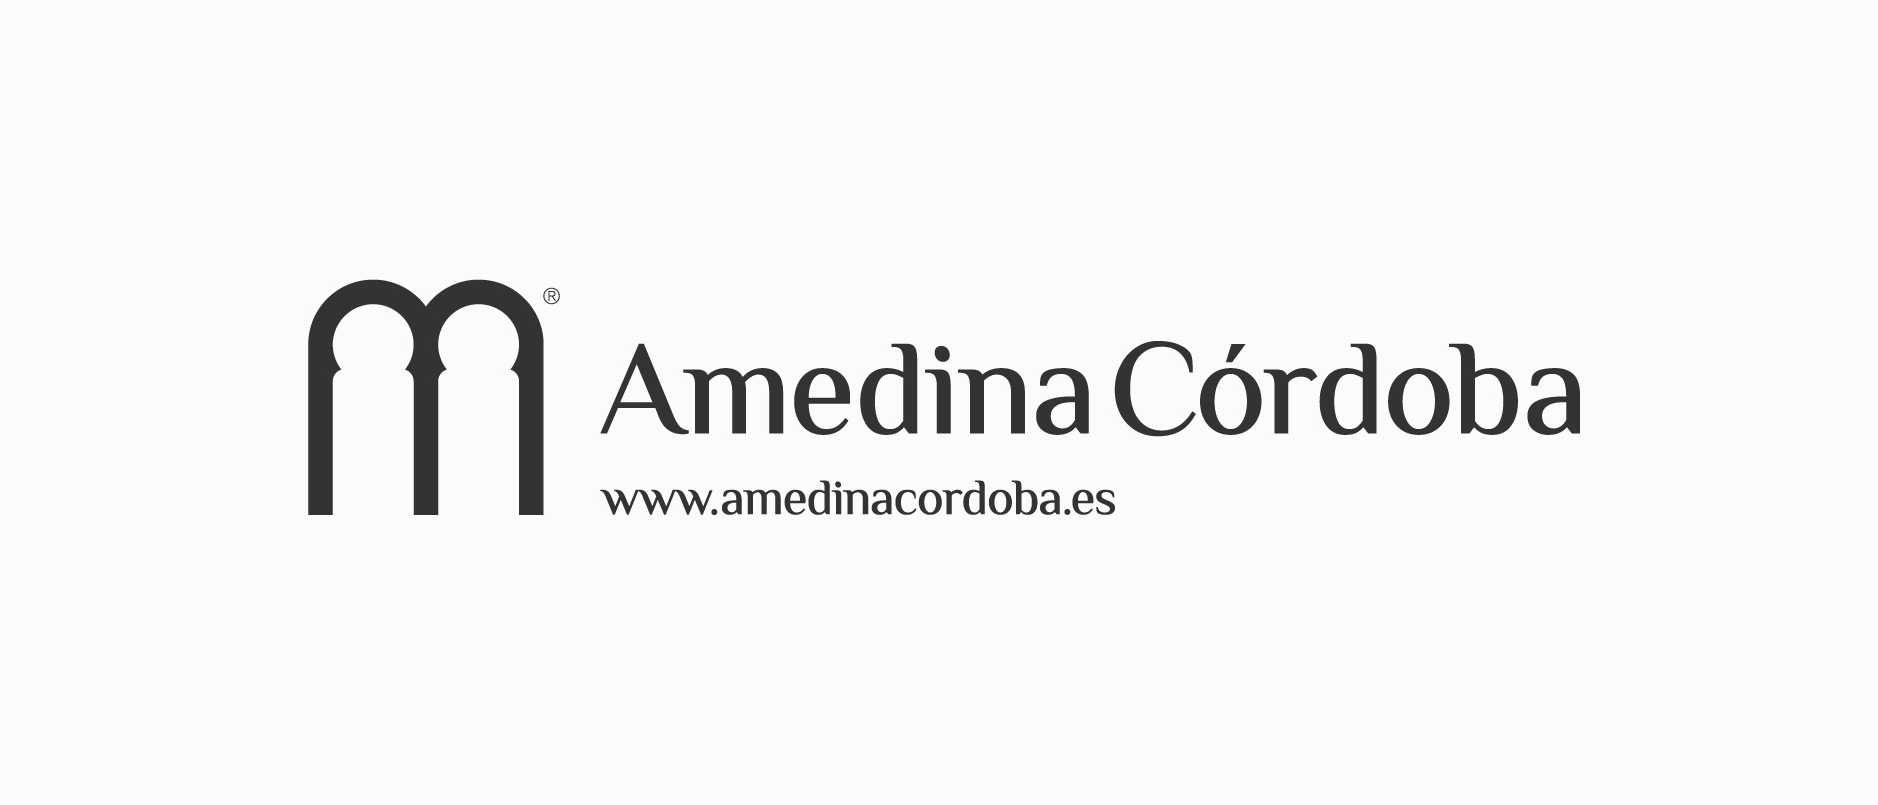 Diseño de Logotipo Amedina Córdoba - tabarestabares